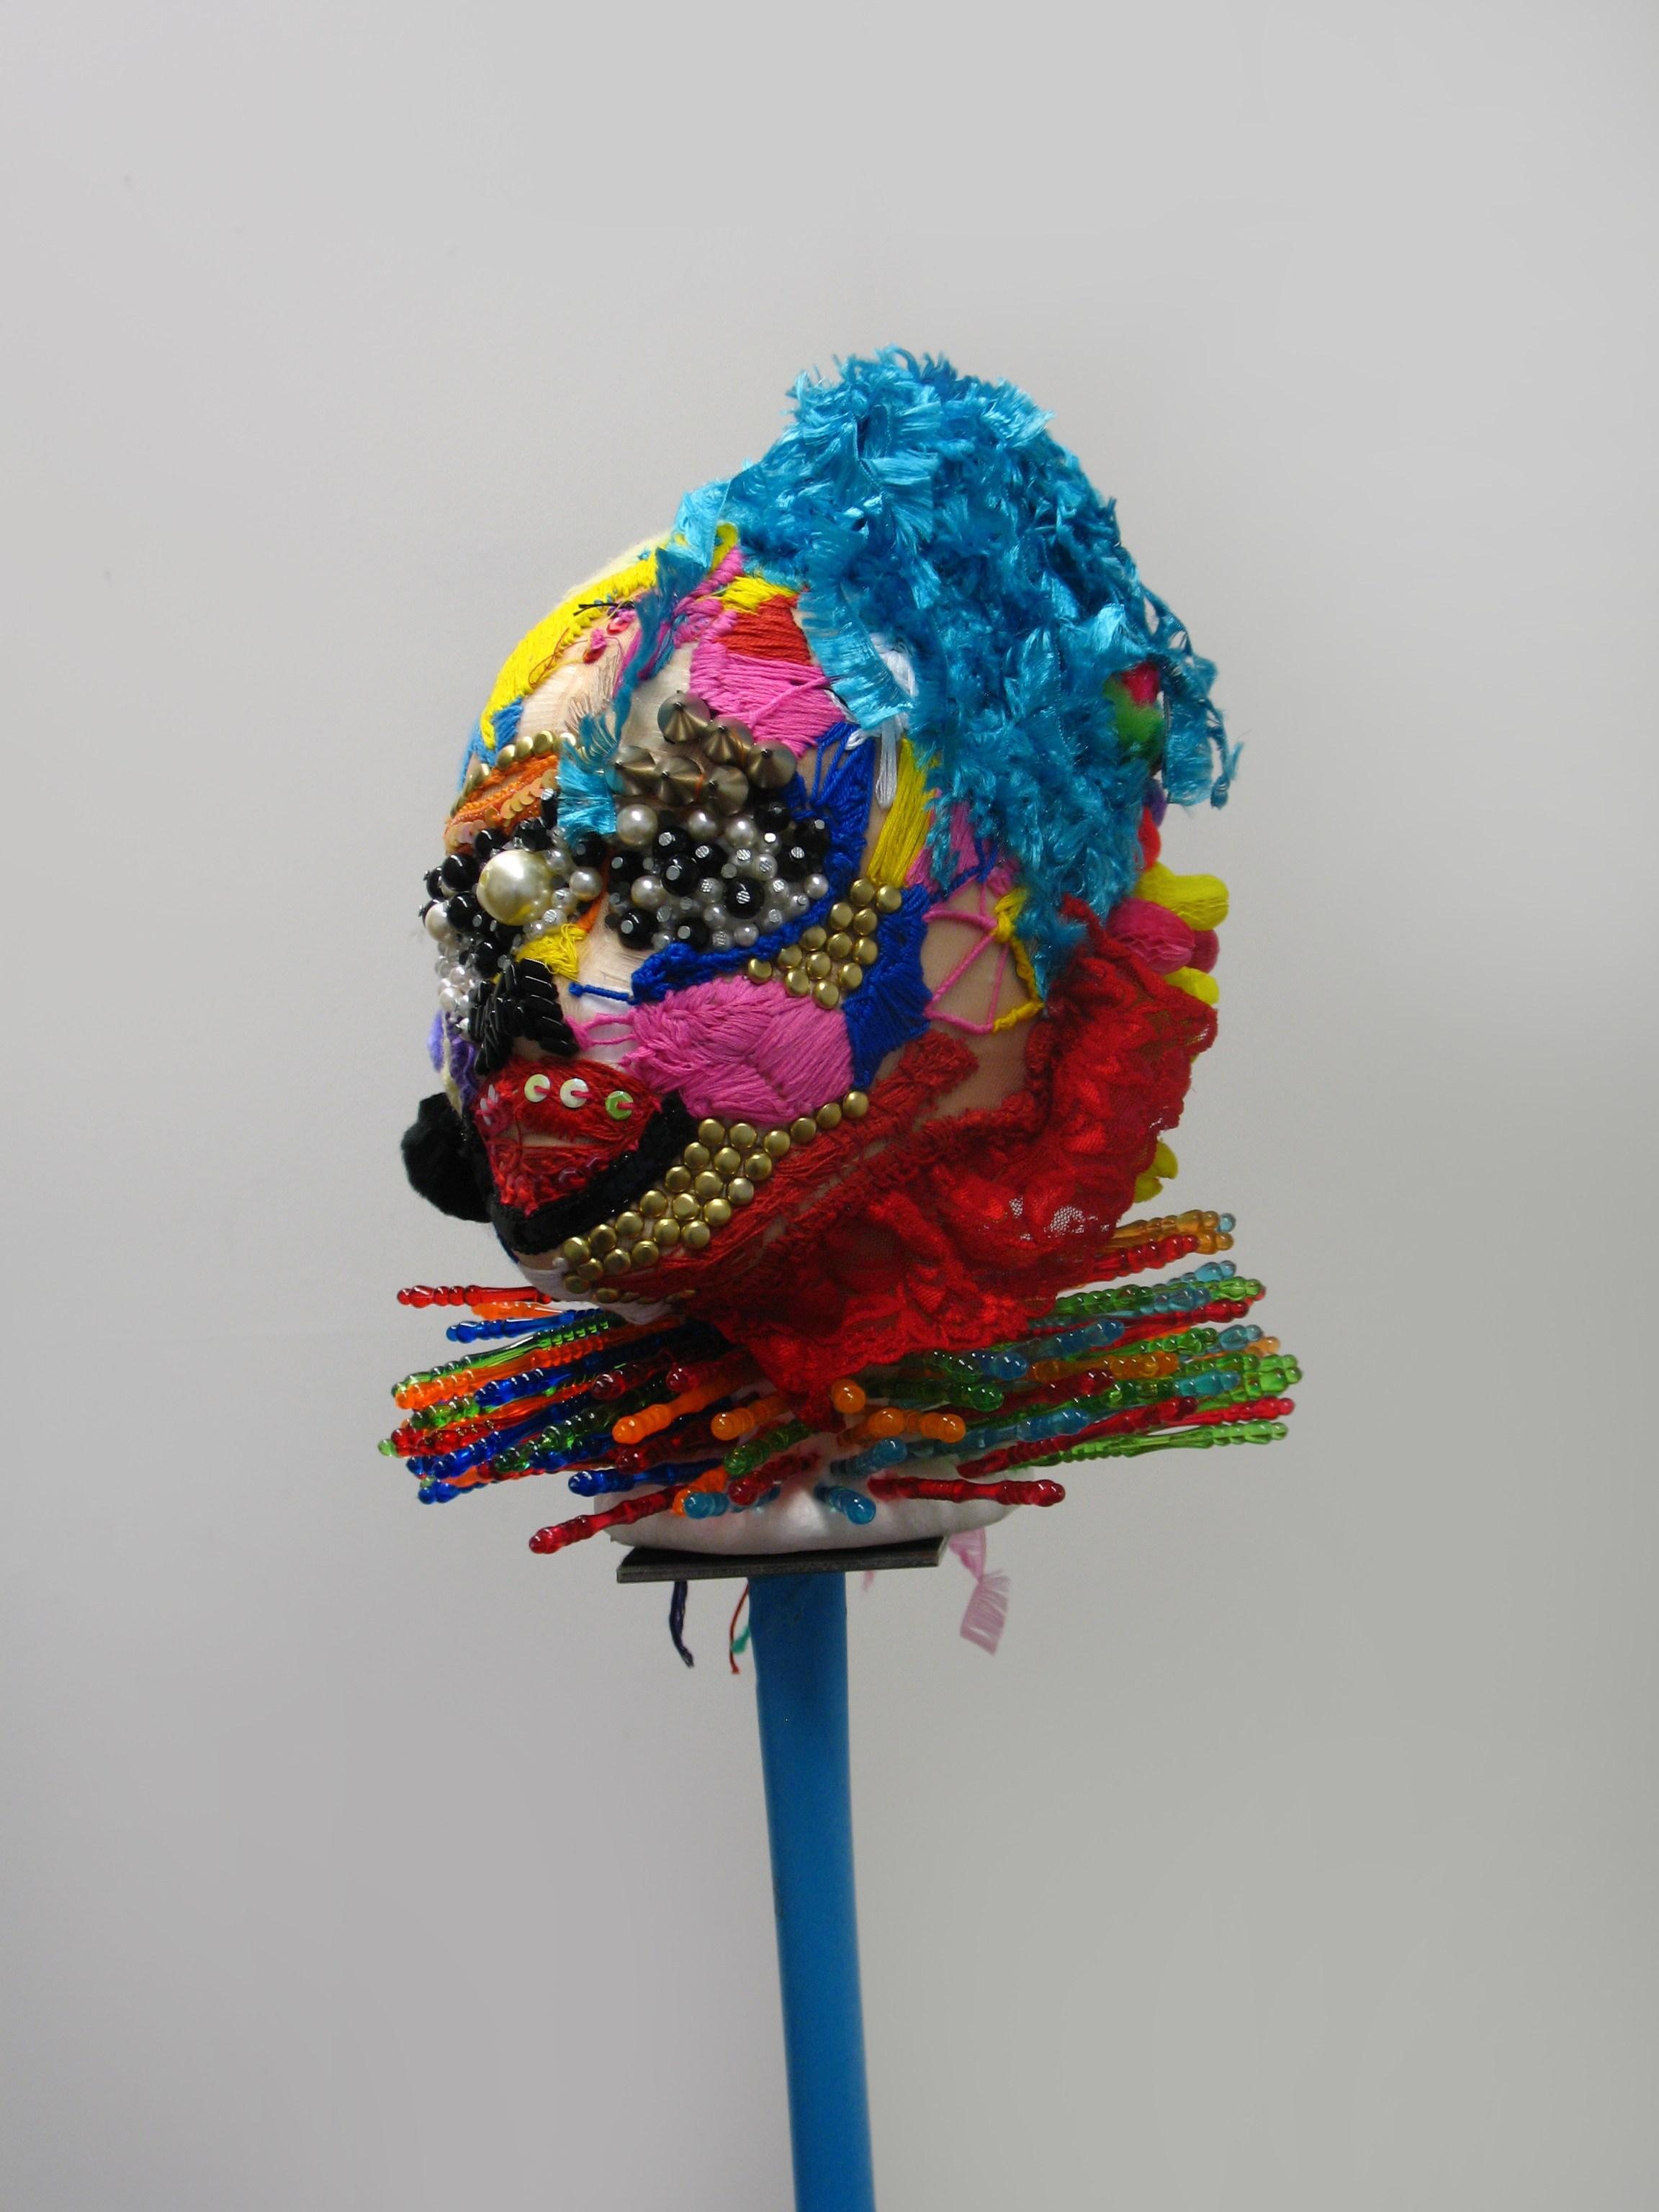 Gilda-Mautone-Balance-Head-2013-mm-150-x-50-x-50cm-1